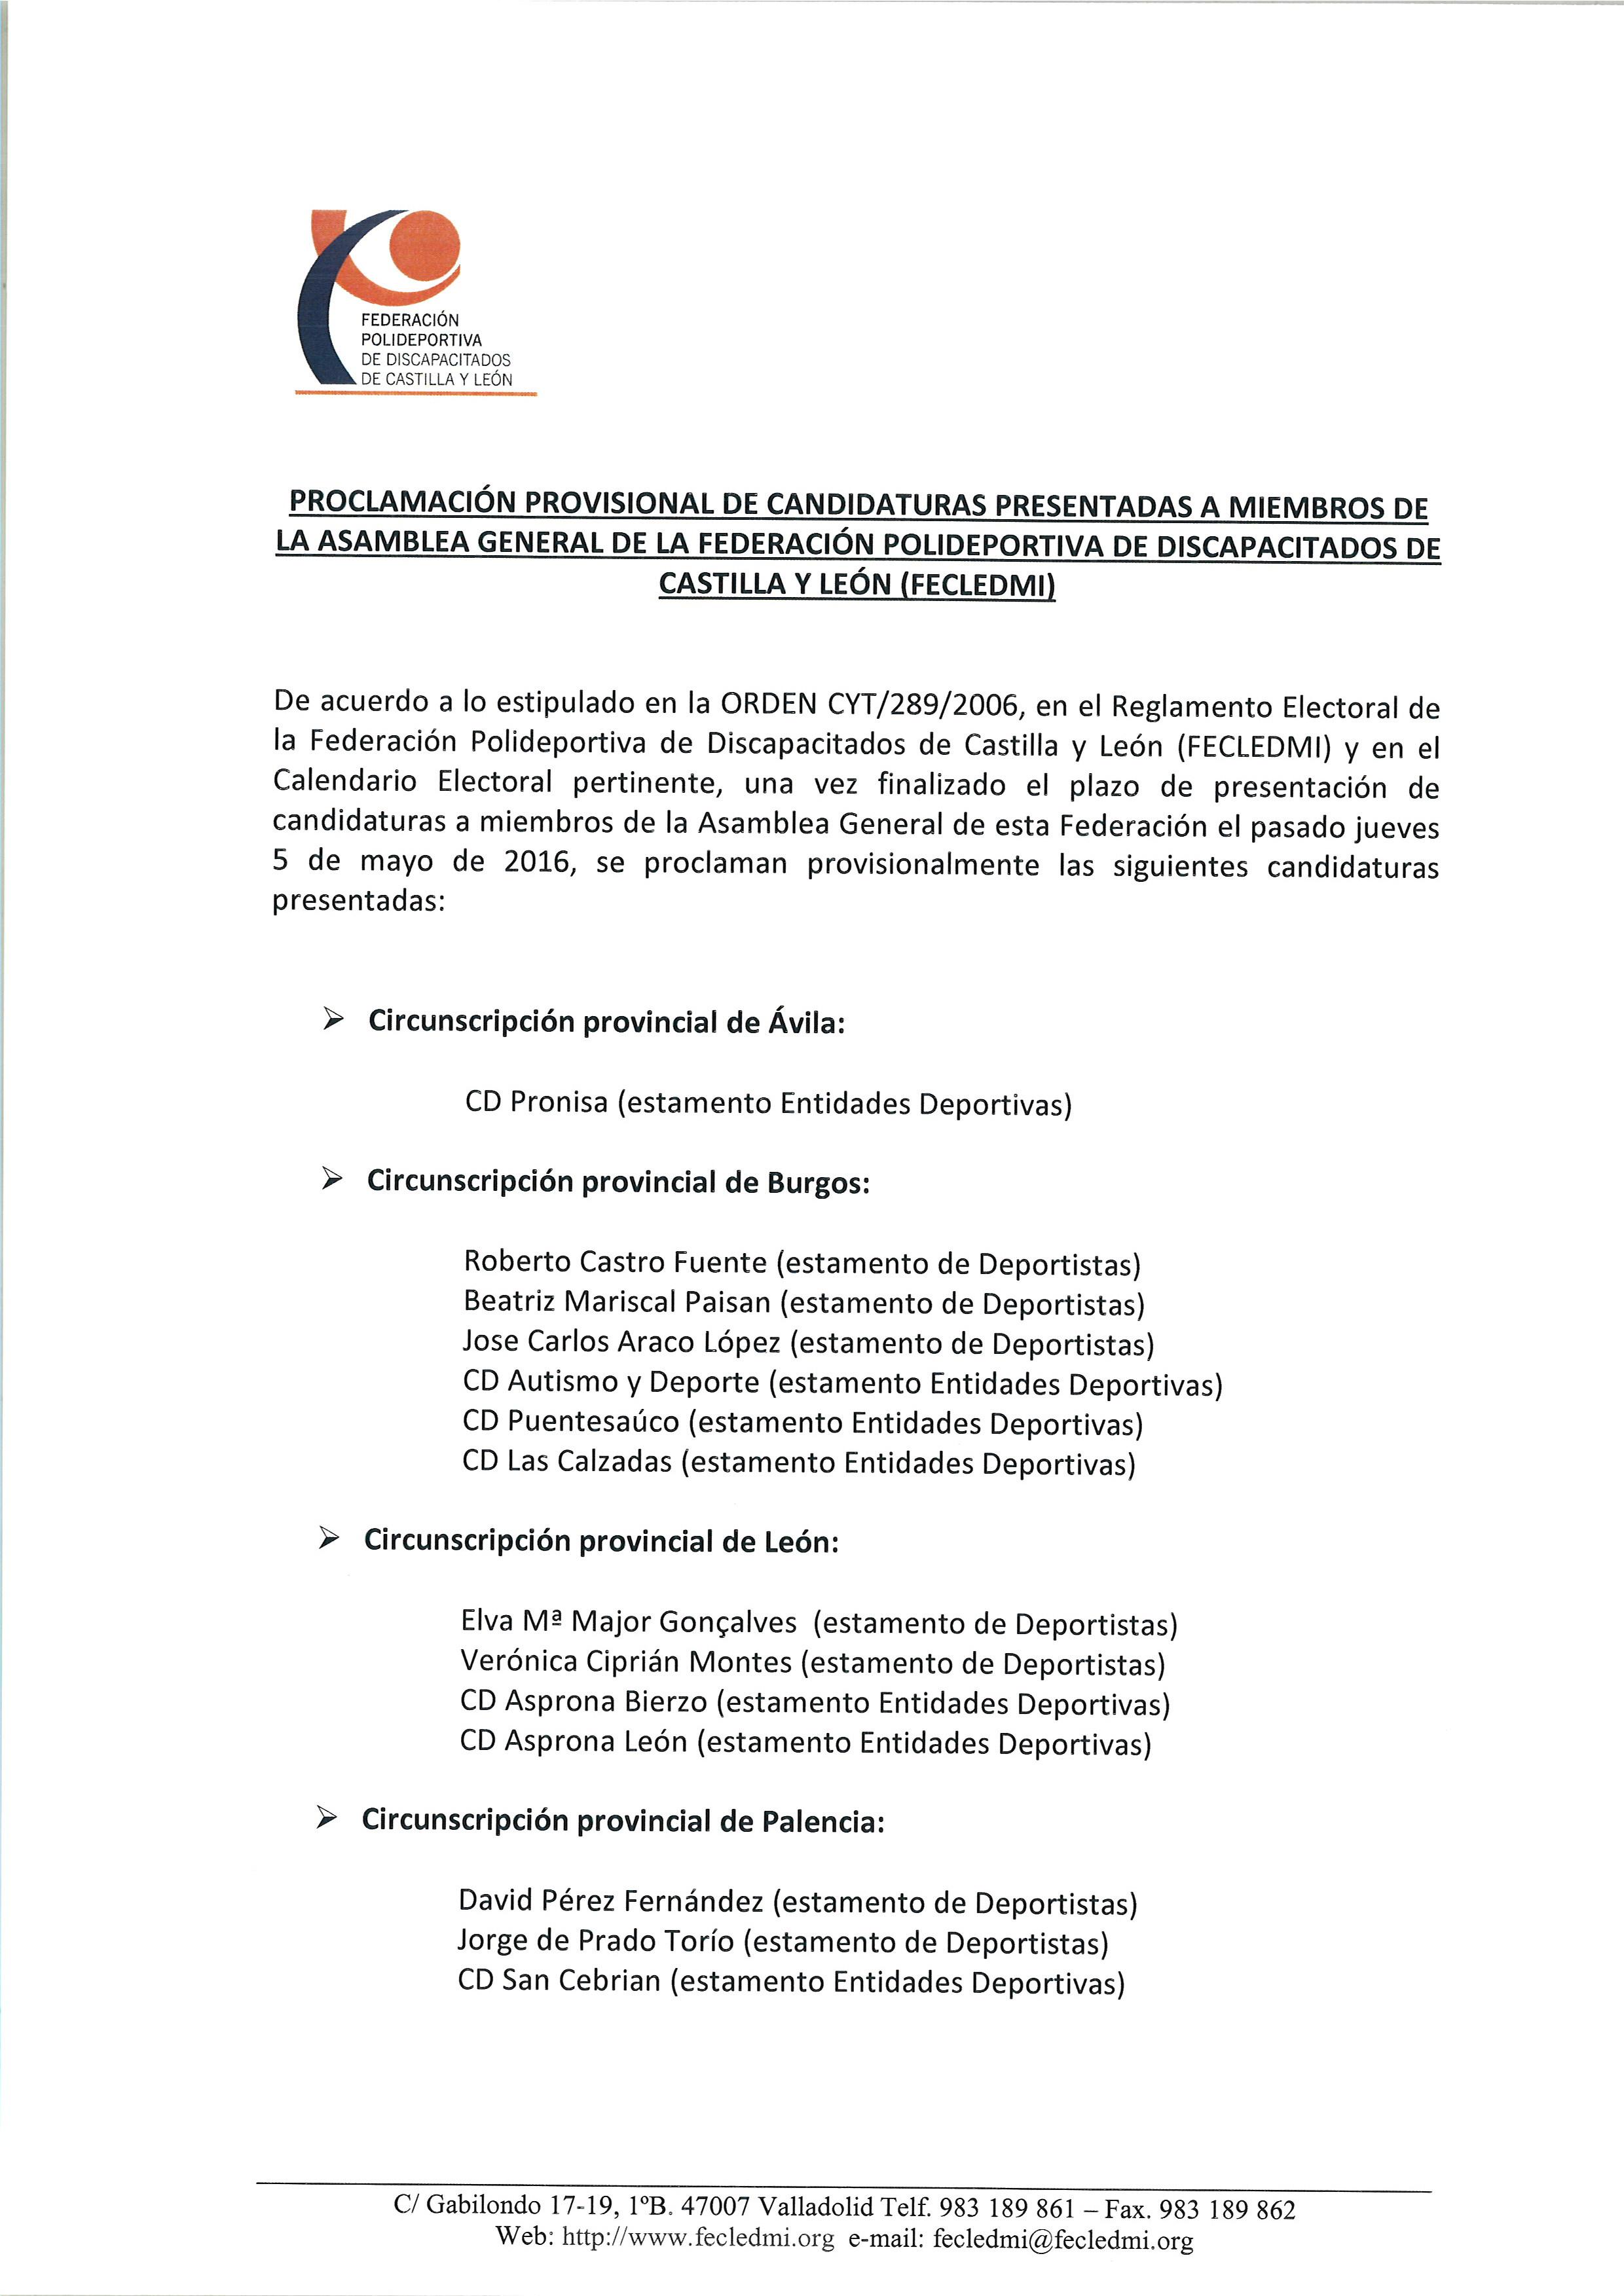 14 Proclamacion Provisional Candidaturas Pgina 1